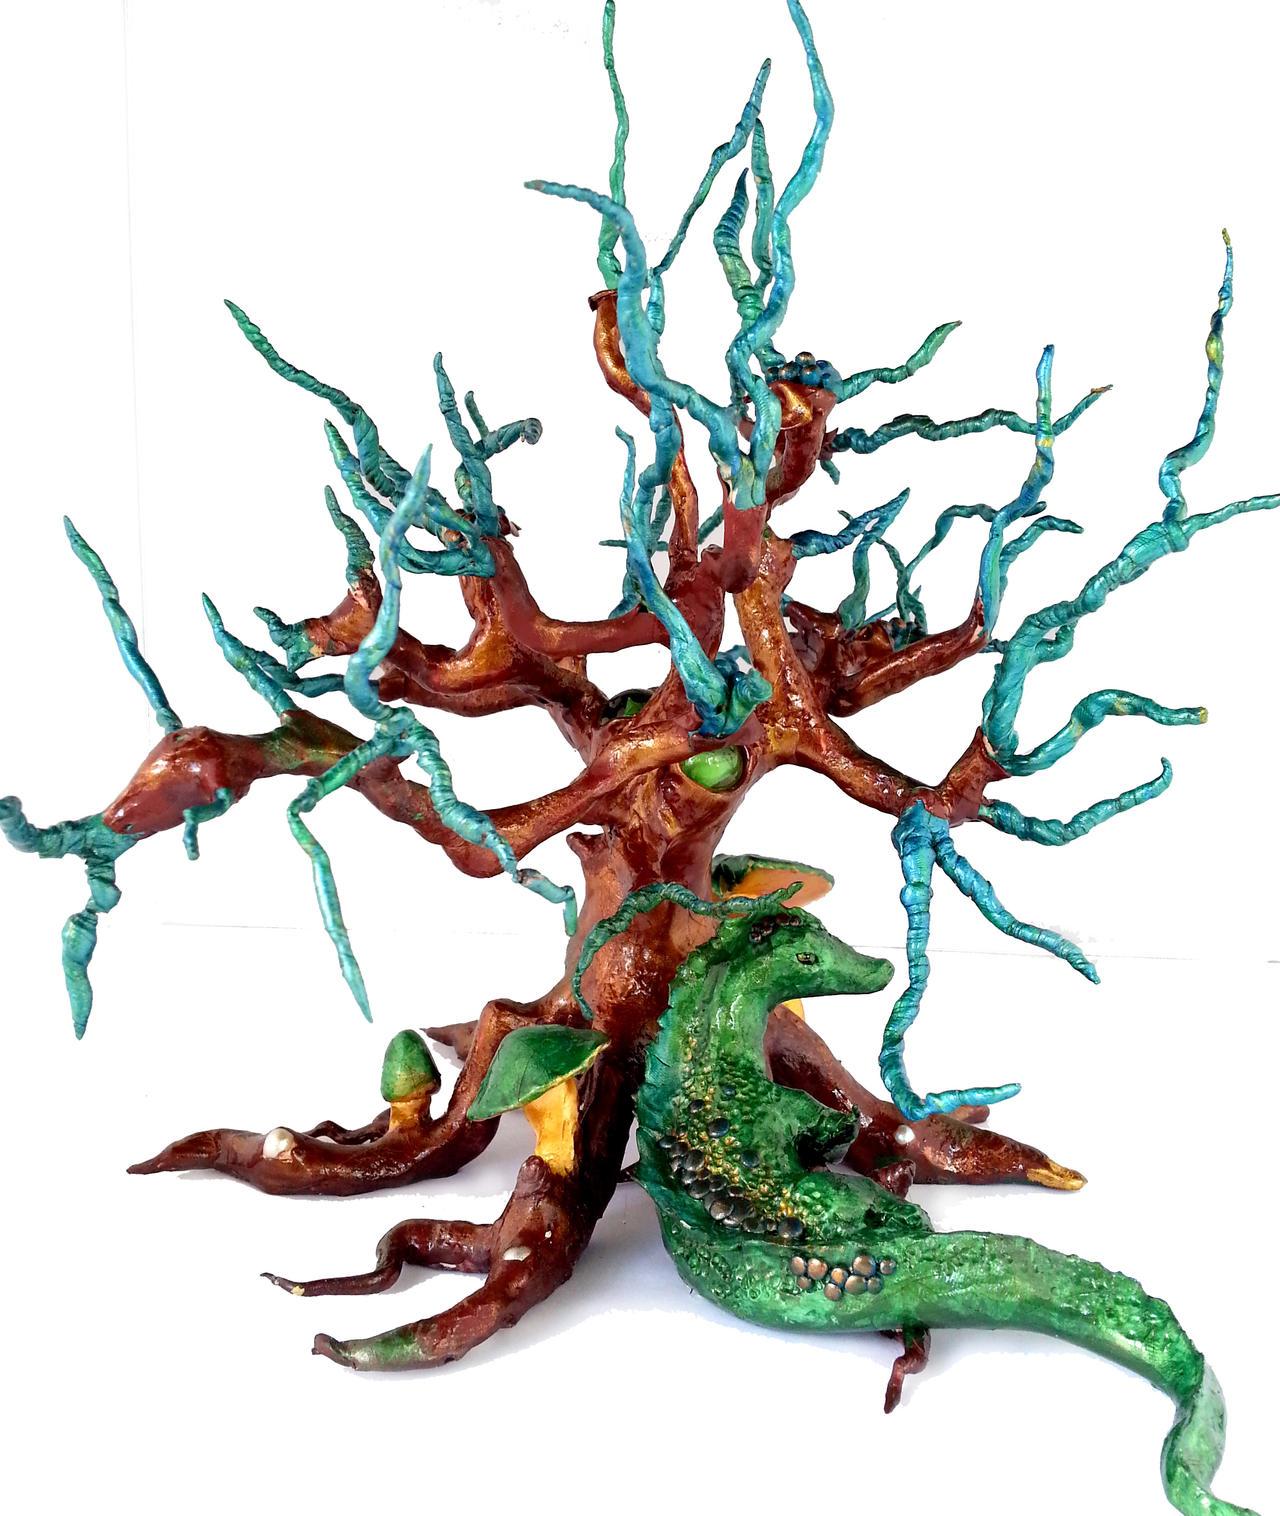 The Moss Dragon